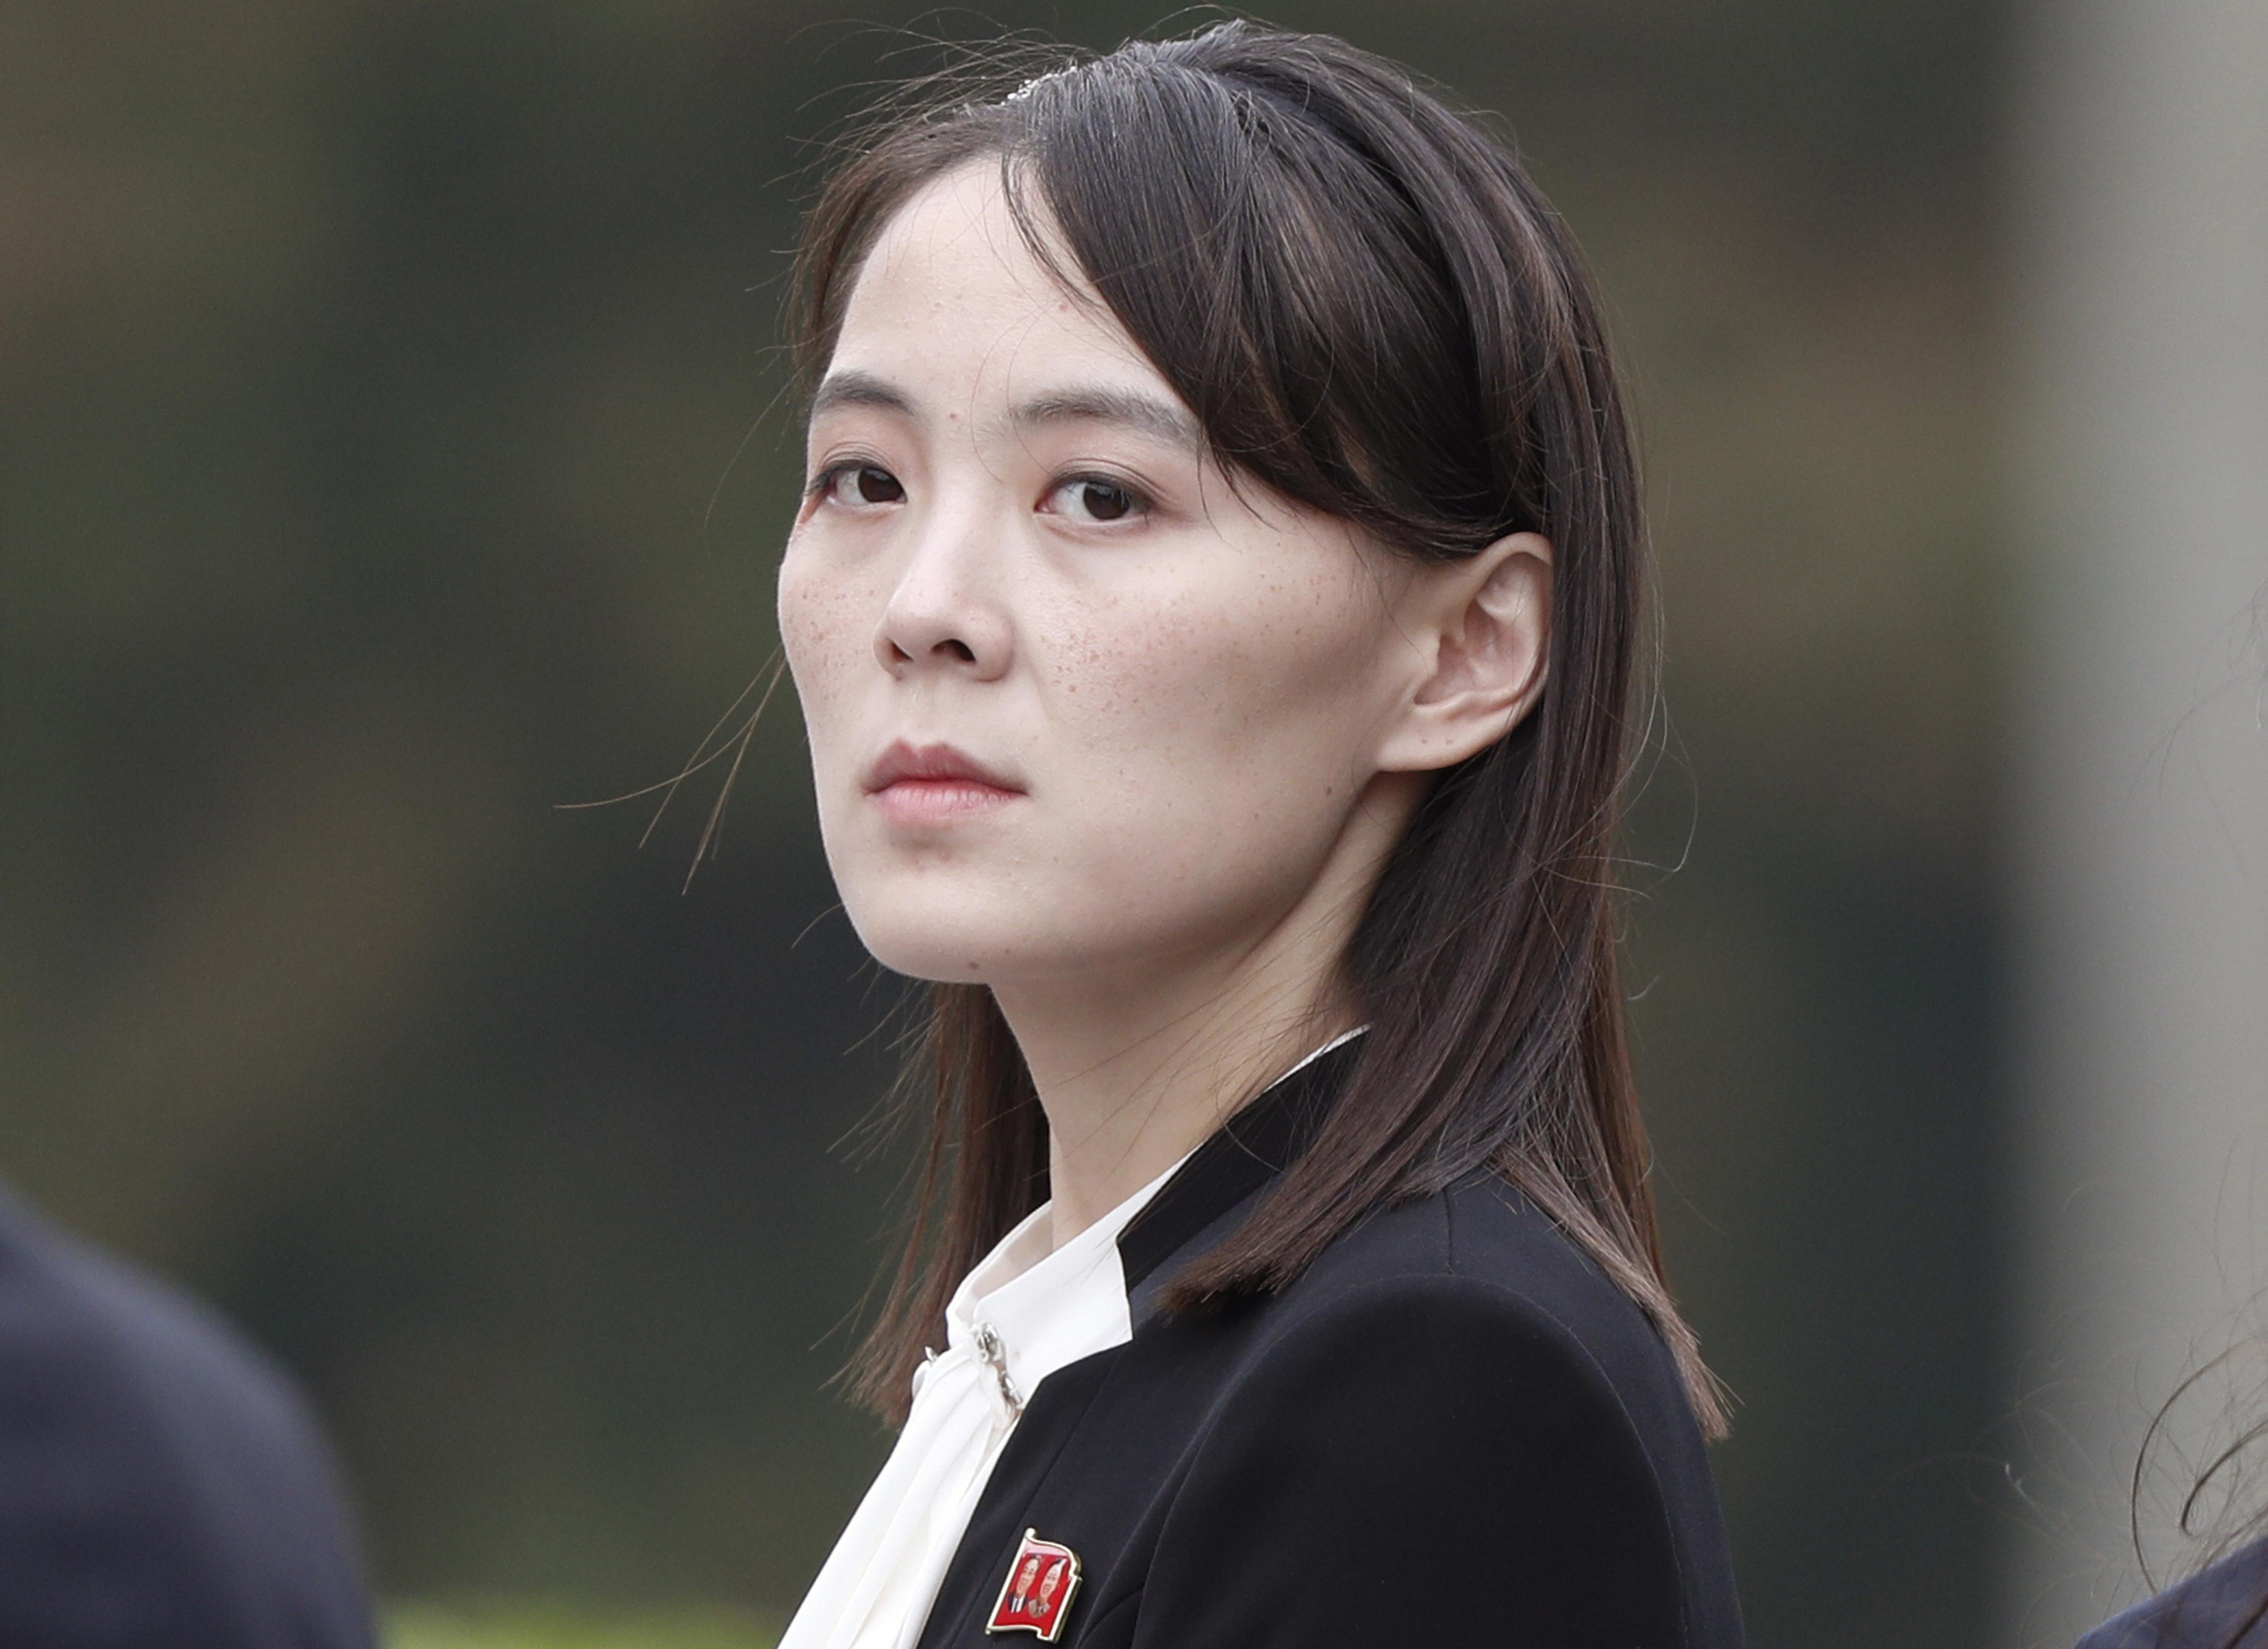 Kim Jong Un's sister's message for South Korea